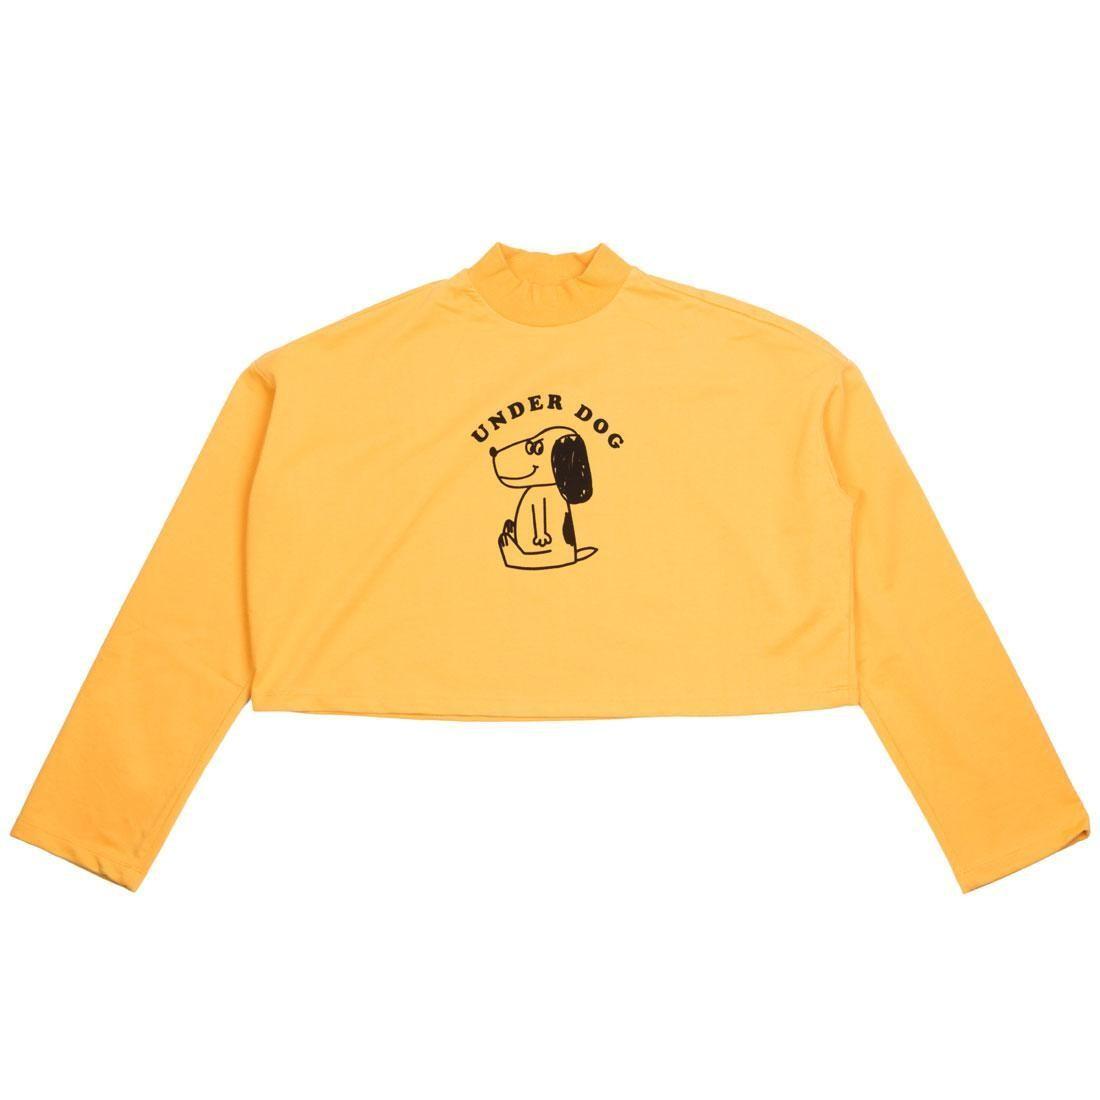 Lazy Oaf Women Underdog Long Sleeve Tee (yellow)